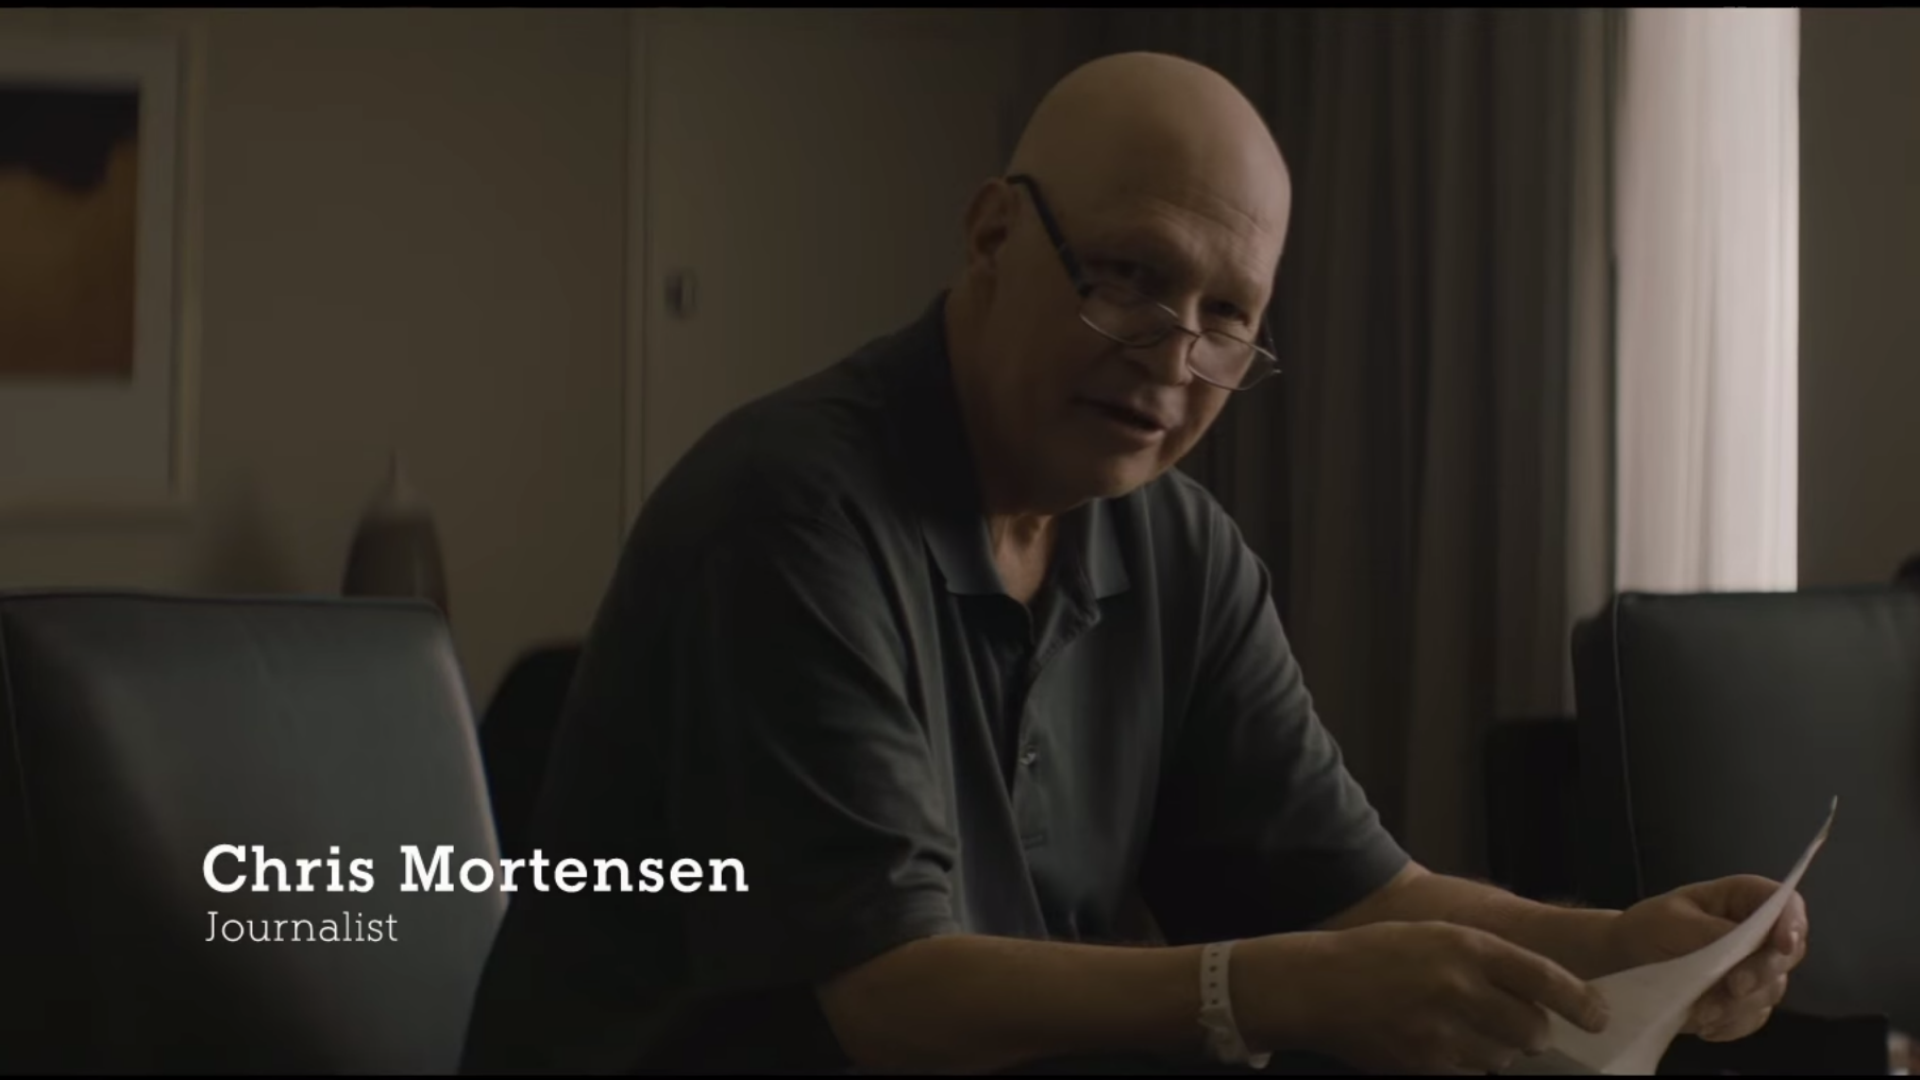 Chris-mortensen-42816-usnews-ftr_1s0e00crawuqp1w3rabr777pyh